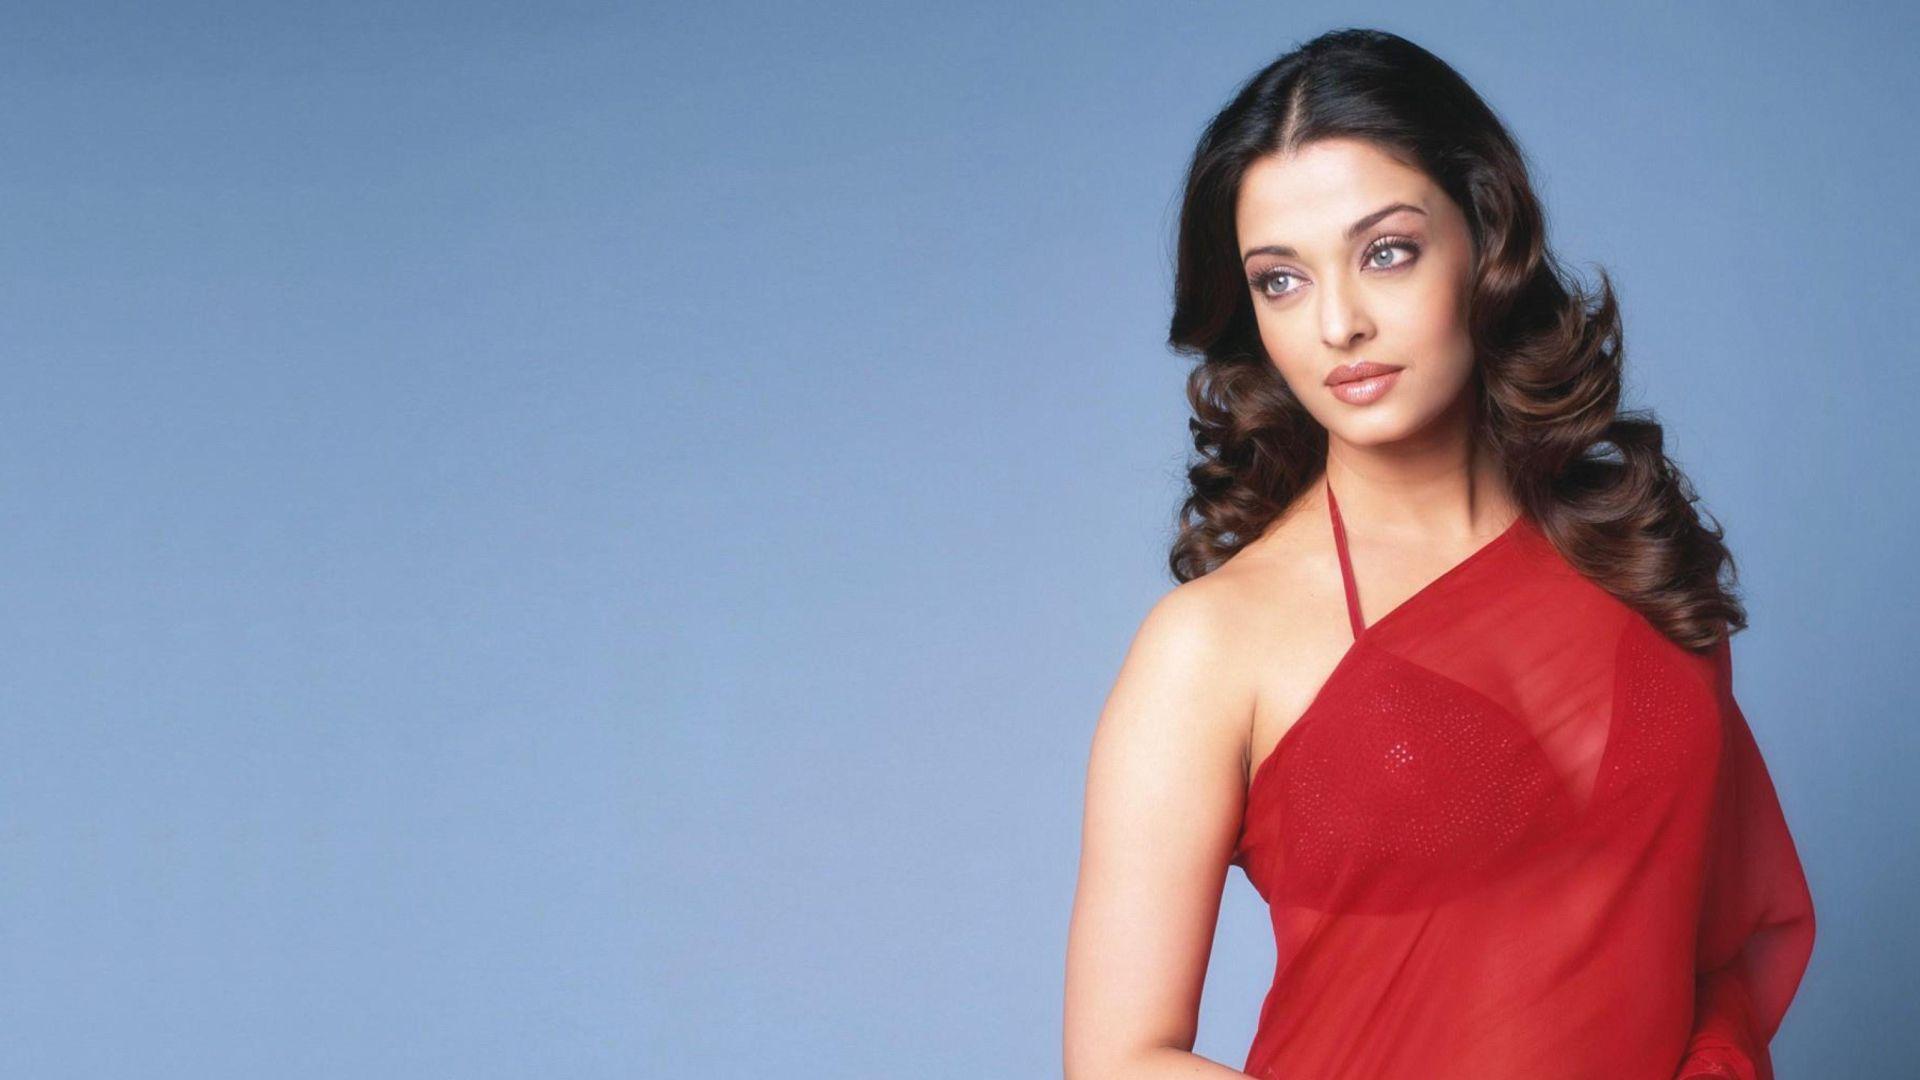 Aishwarya Rai Photo 2005